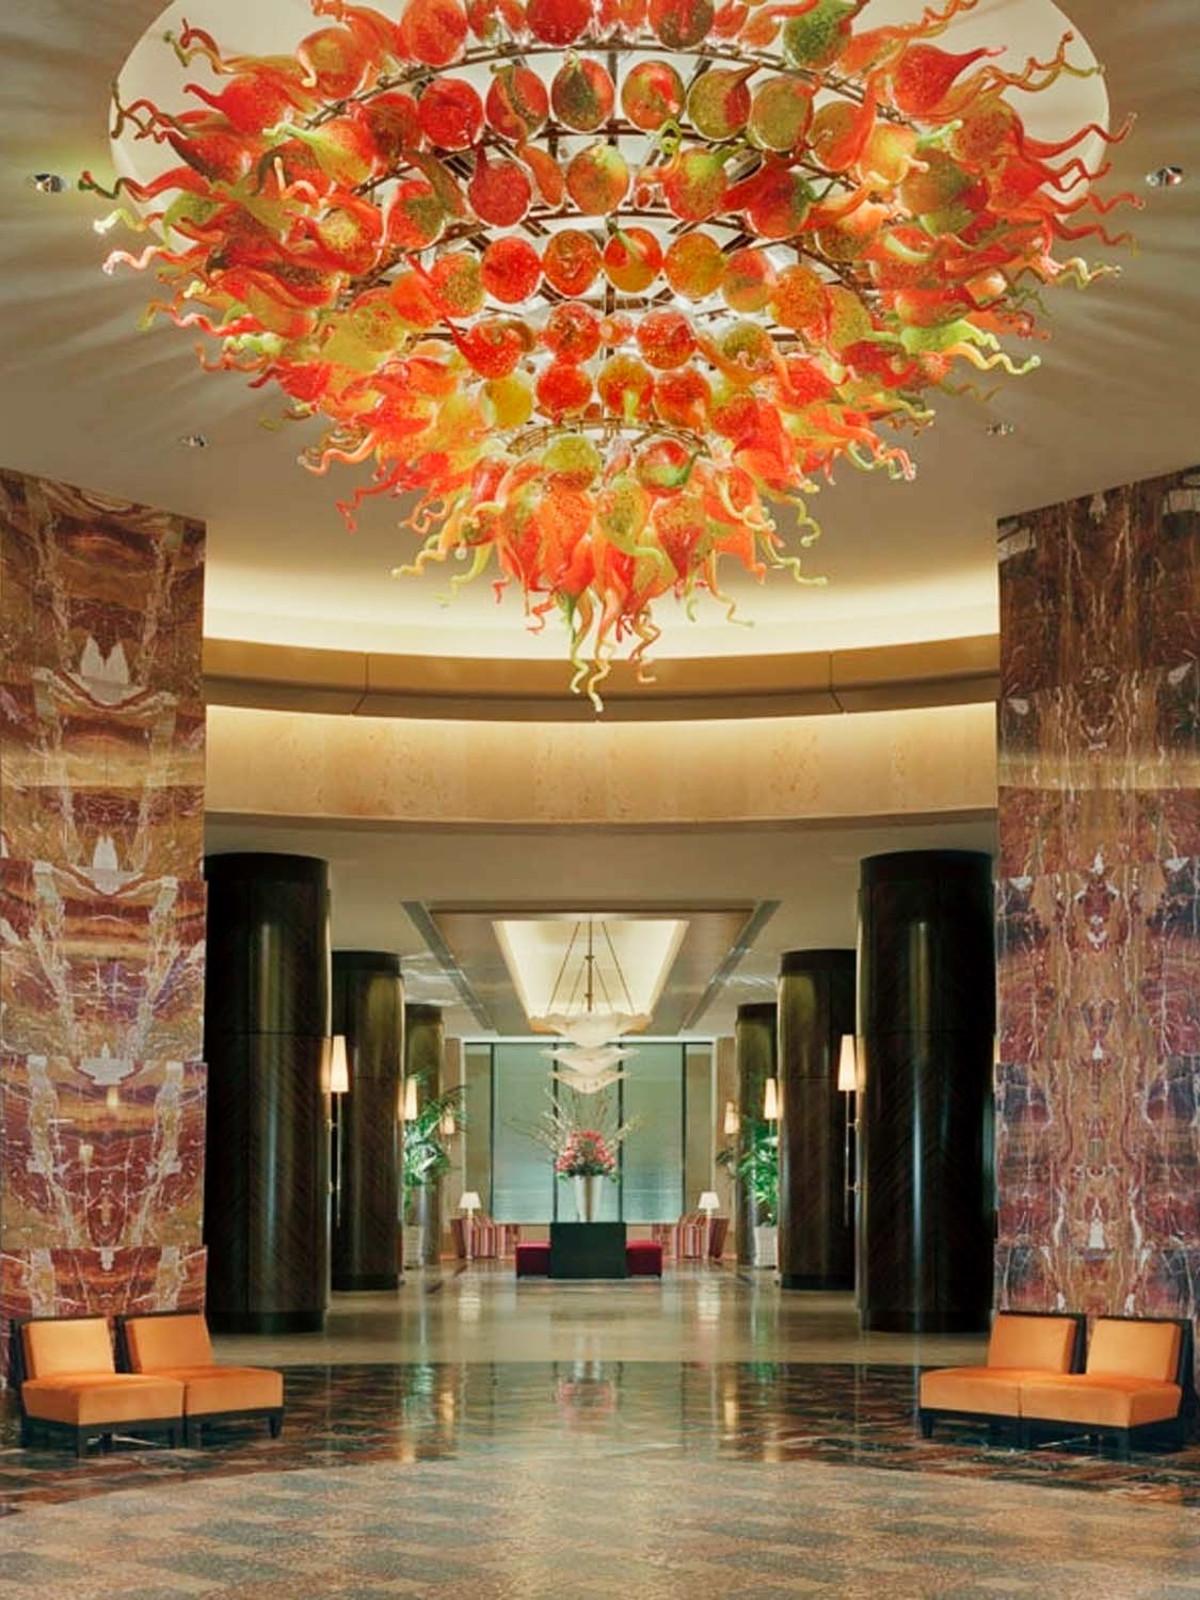 Places Hotels Spas Hilton Americas Houston Rotunda